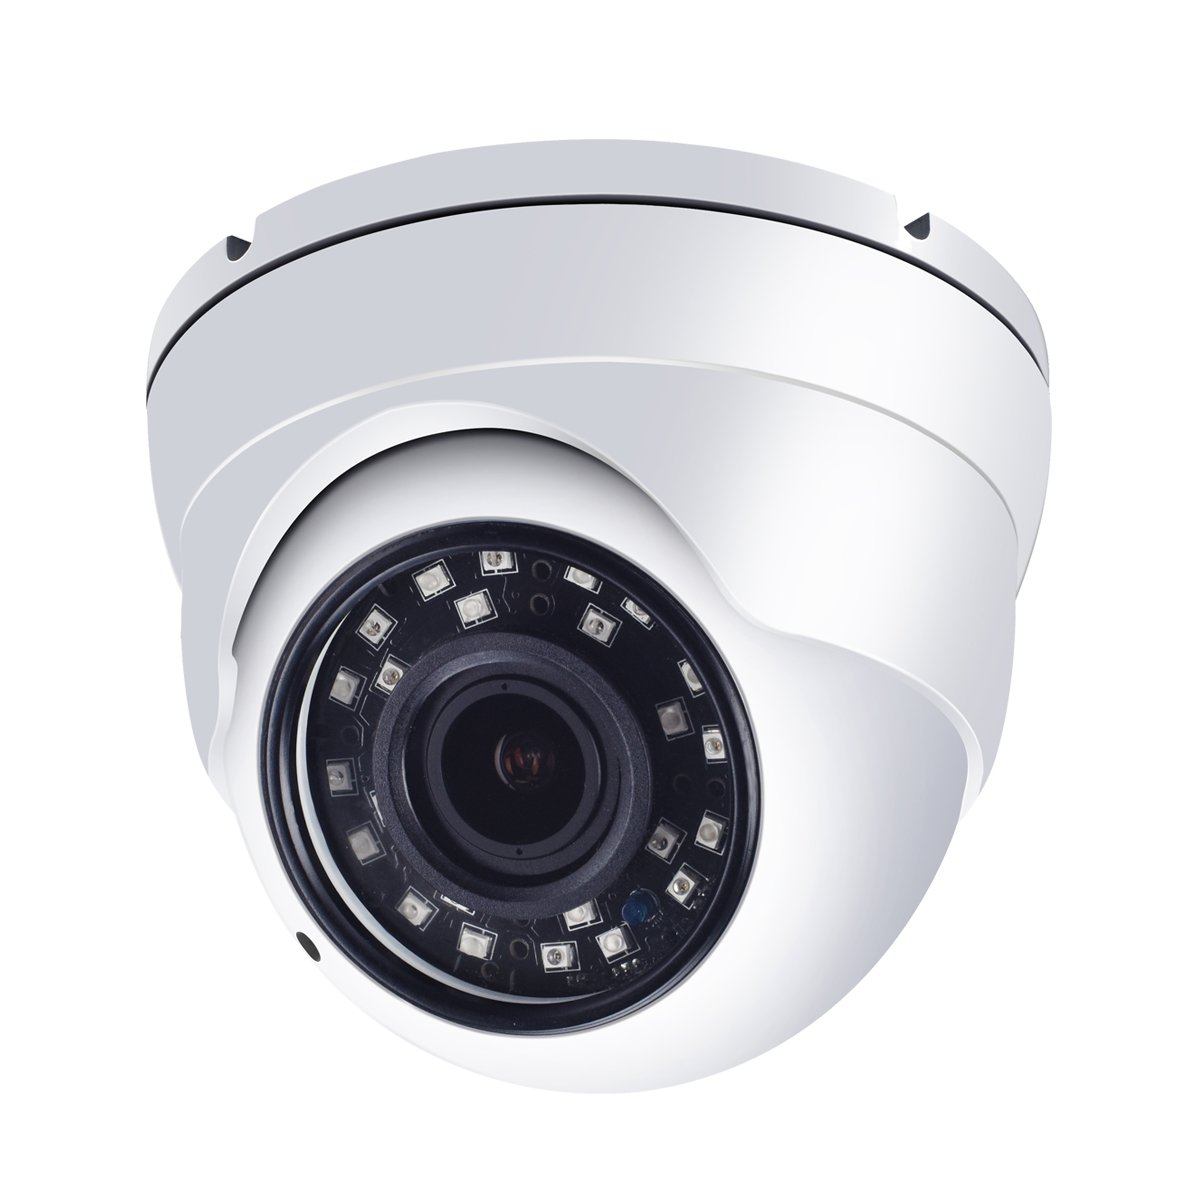 HD BNC 1080p CCTV Dome Security Camera, 2.8-12MM Varifocal Lens, TVI/AHD/CVI/960H 4-in-1 Analog Day Night Surveillance Camera System, IP66 Weatherproof Outdoor Metal